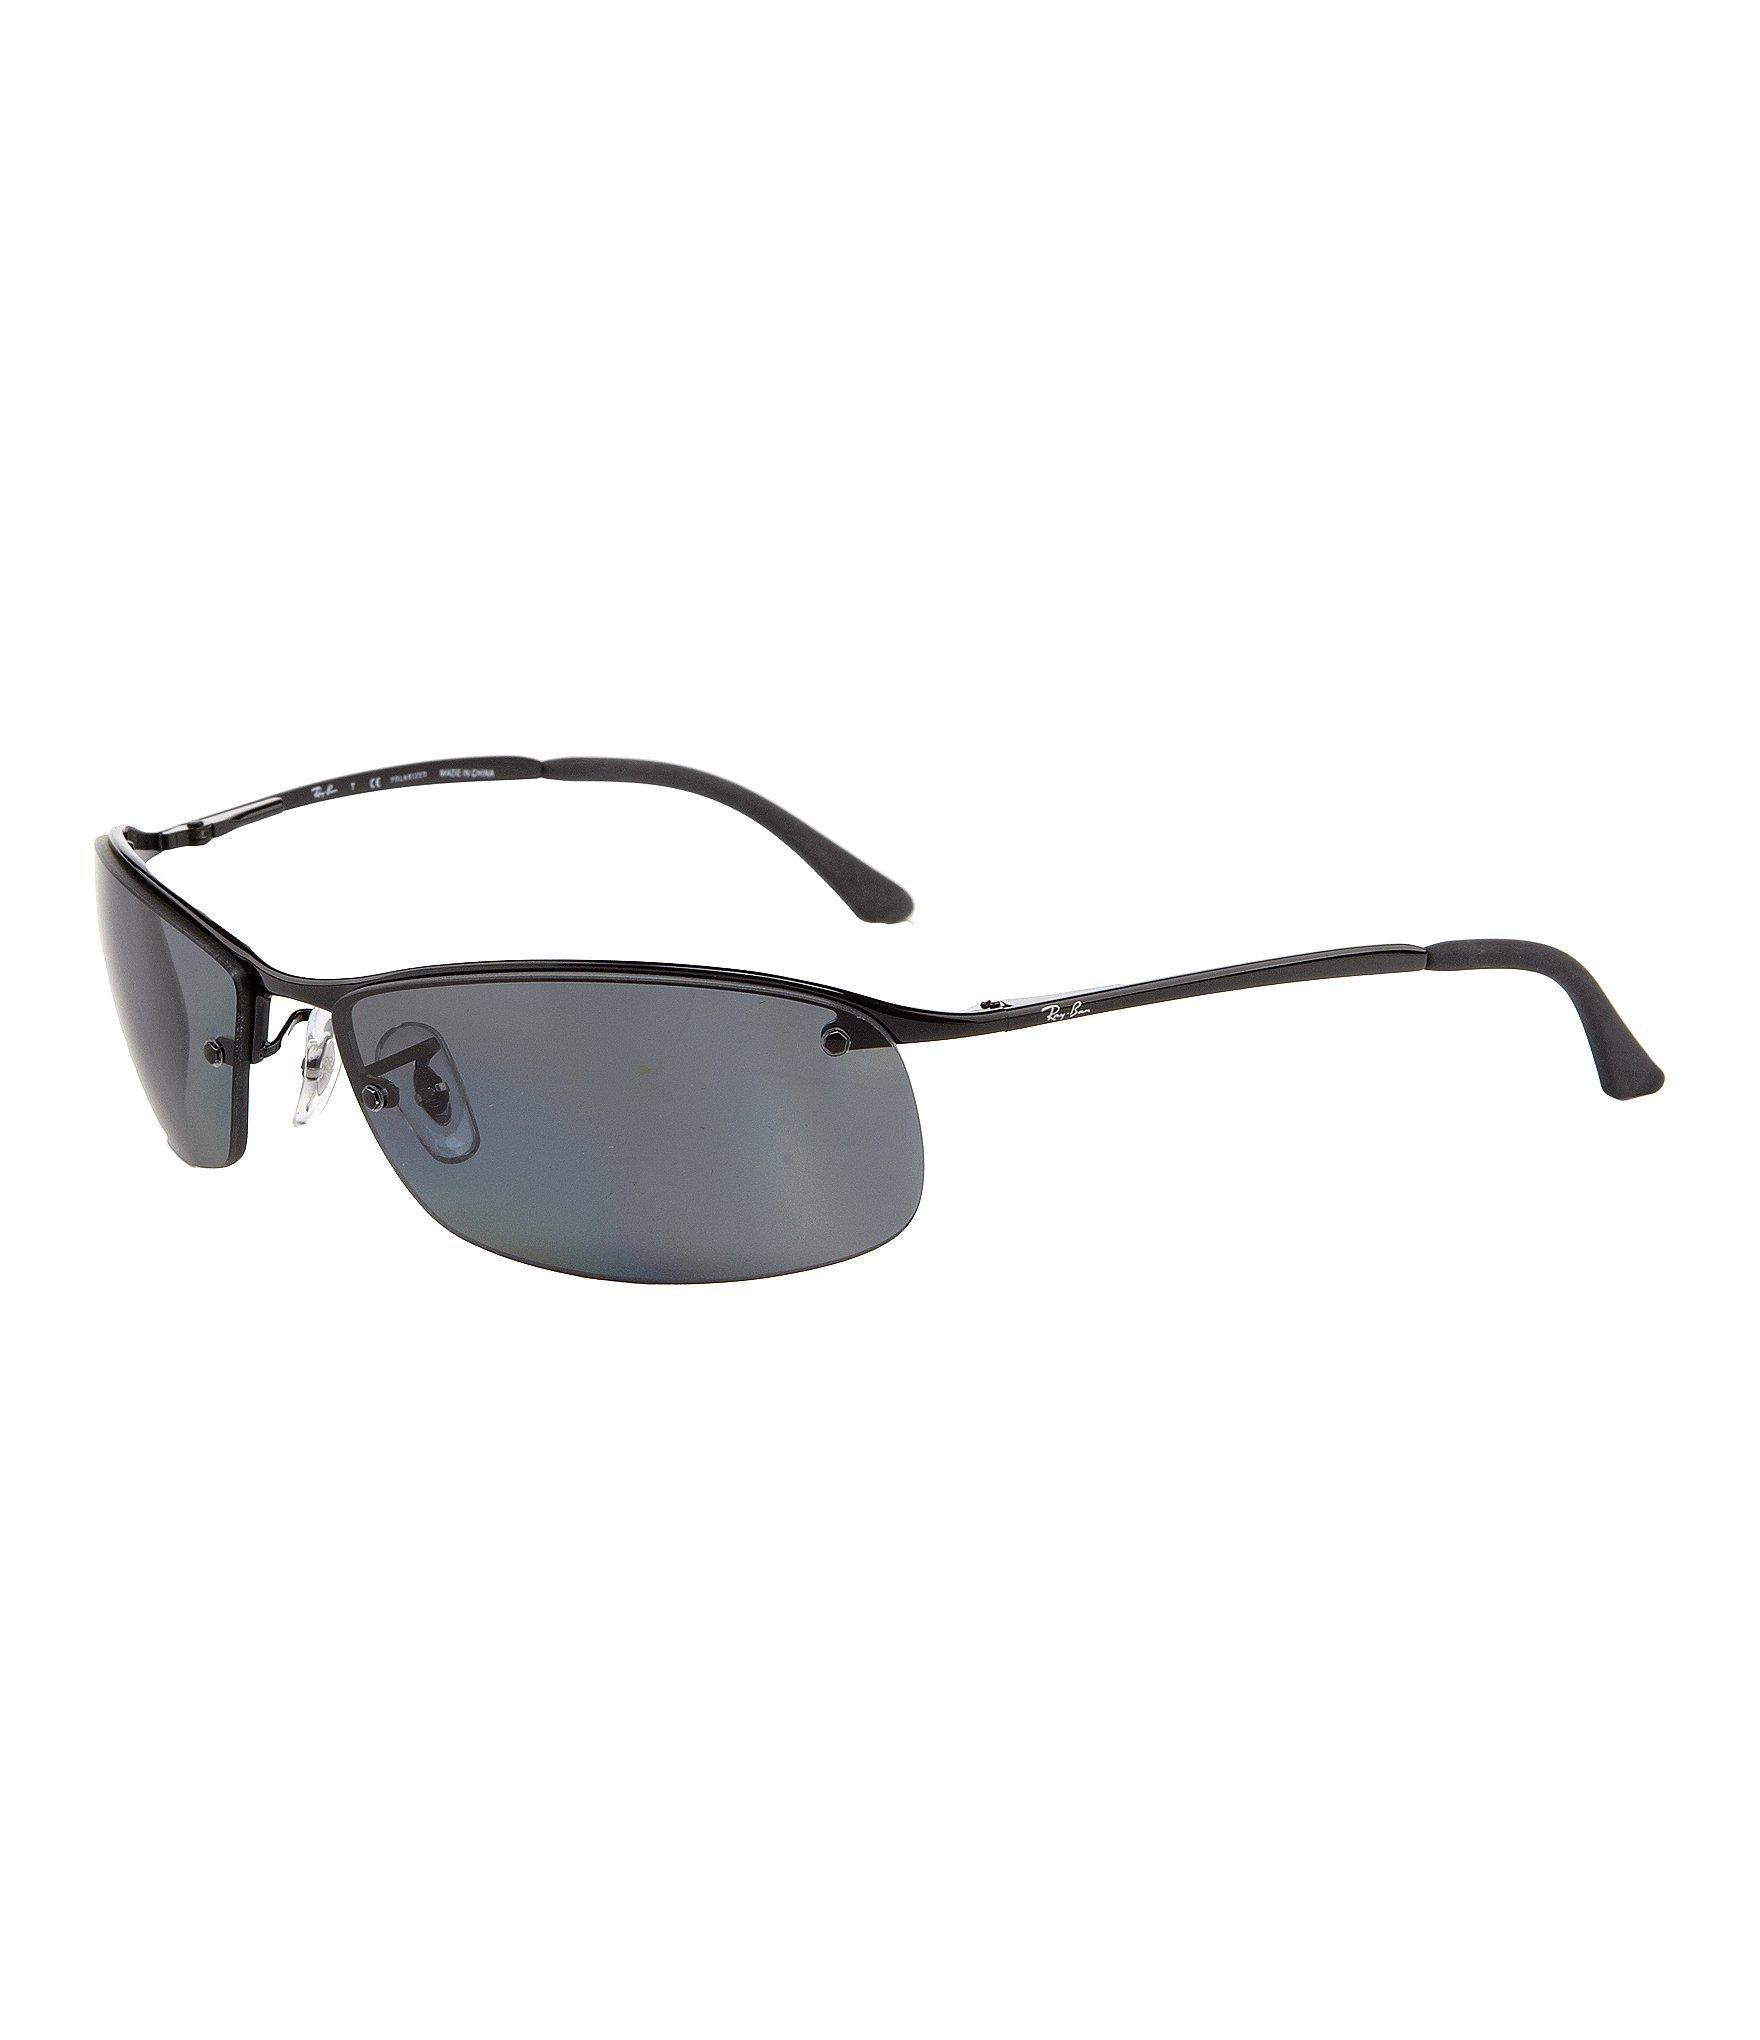 c836ffbdf834 Ray-Ban. Men s Black Polarized Uva uvb Protection Rectangular Sunglasses